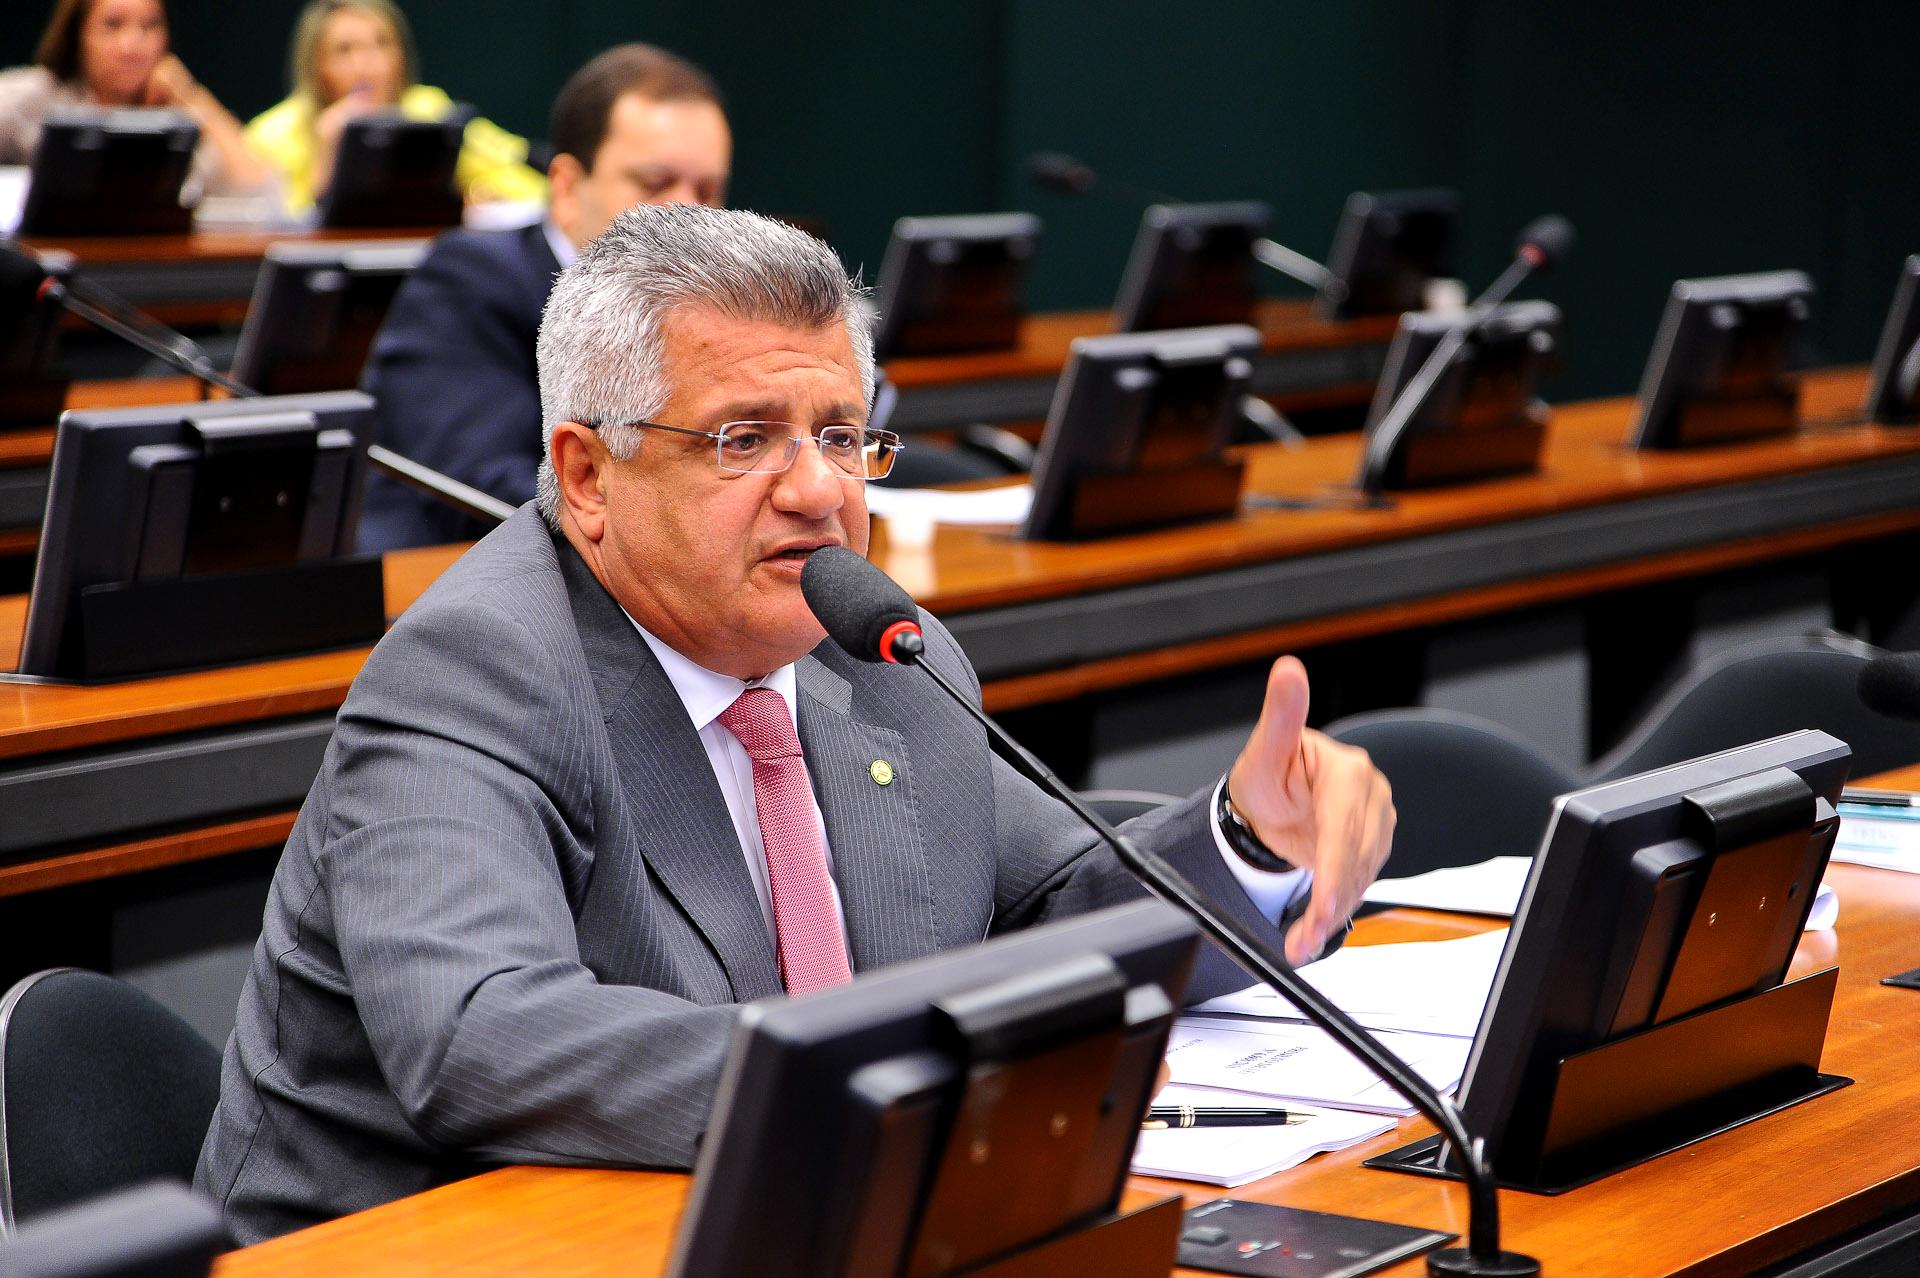 Bacelar ressalta liderança de Rui Costa contra fechamento da Fafen